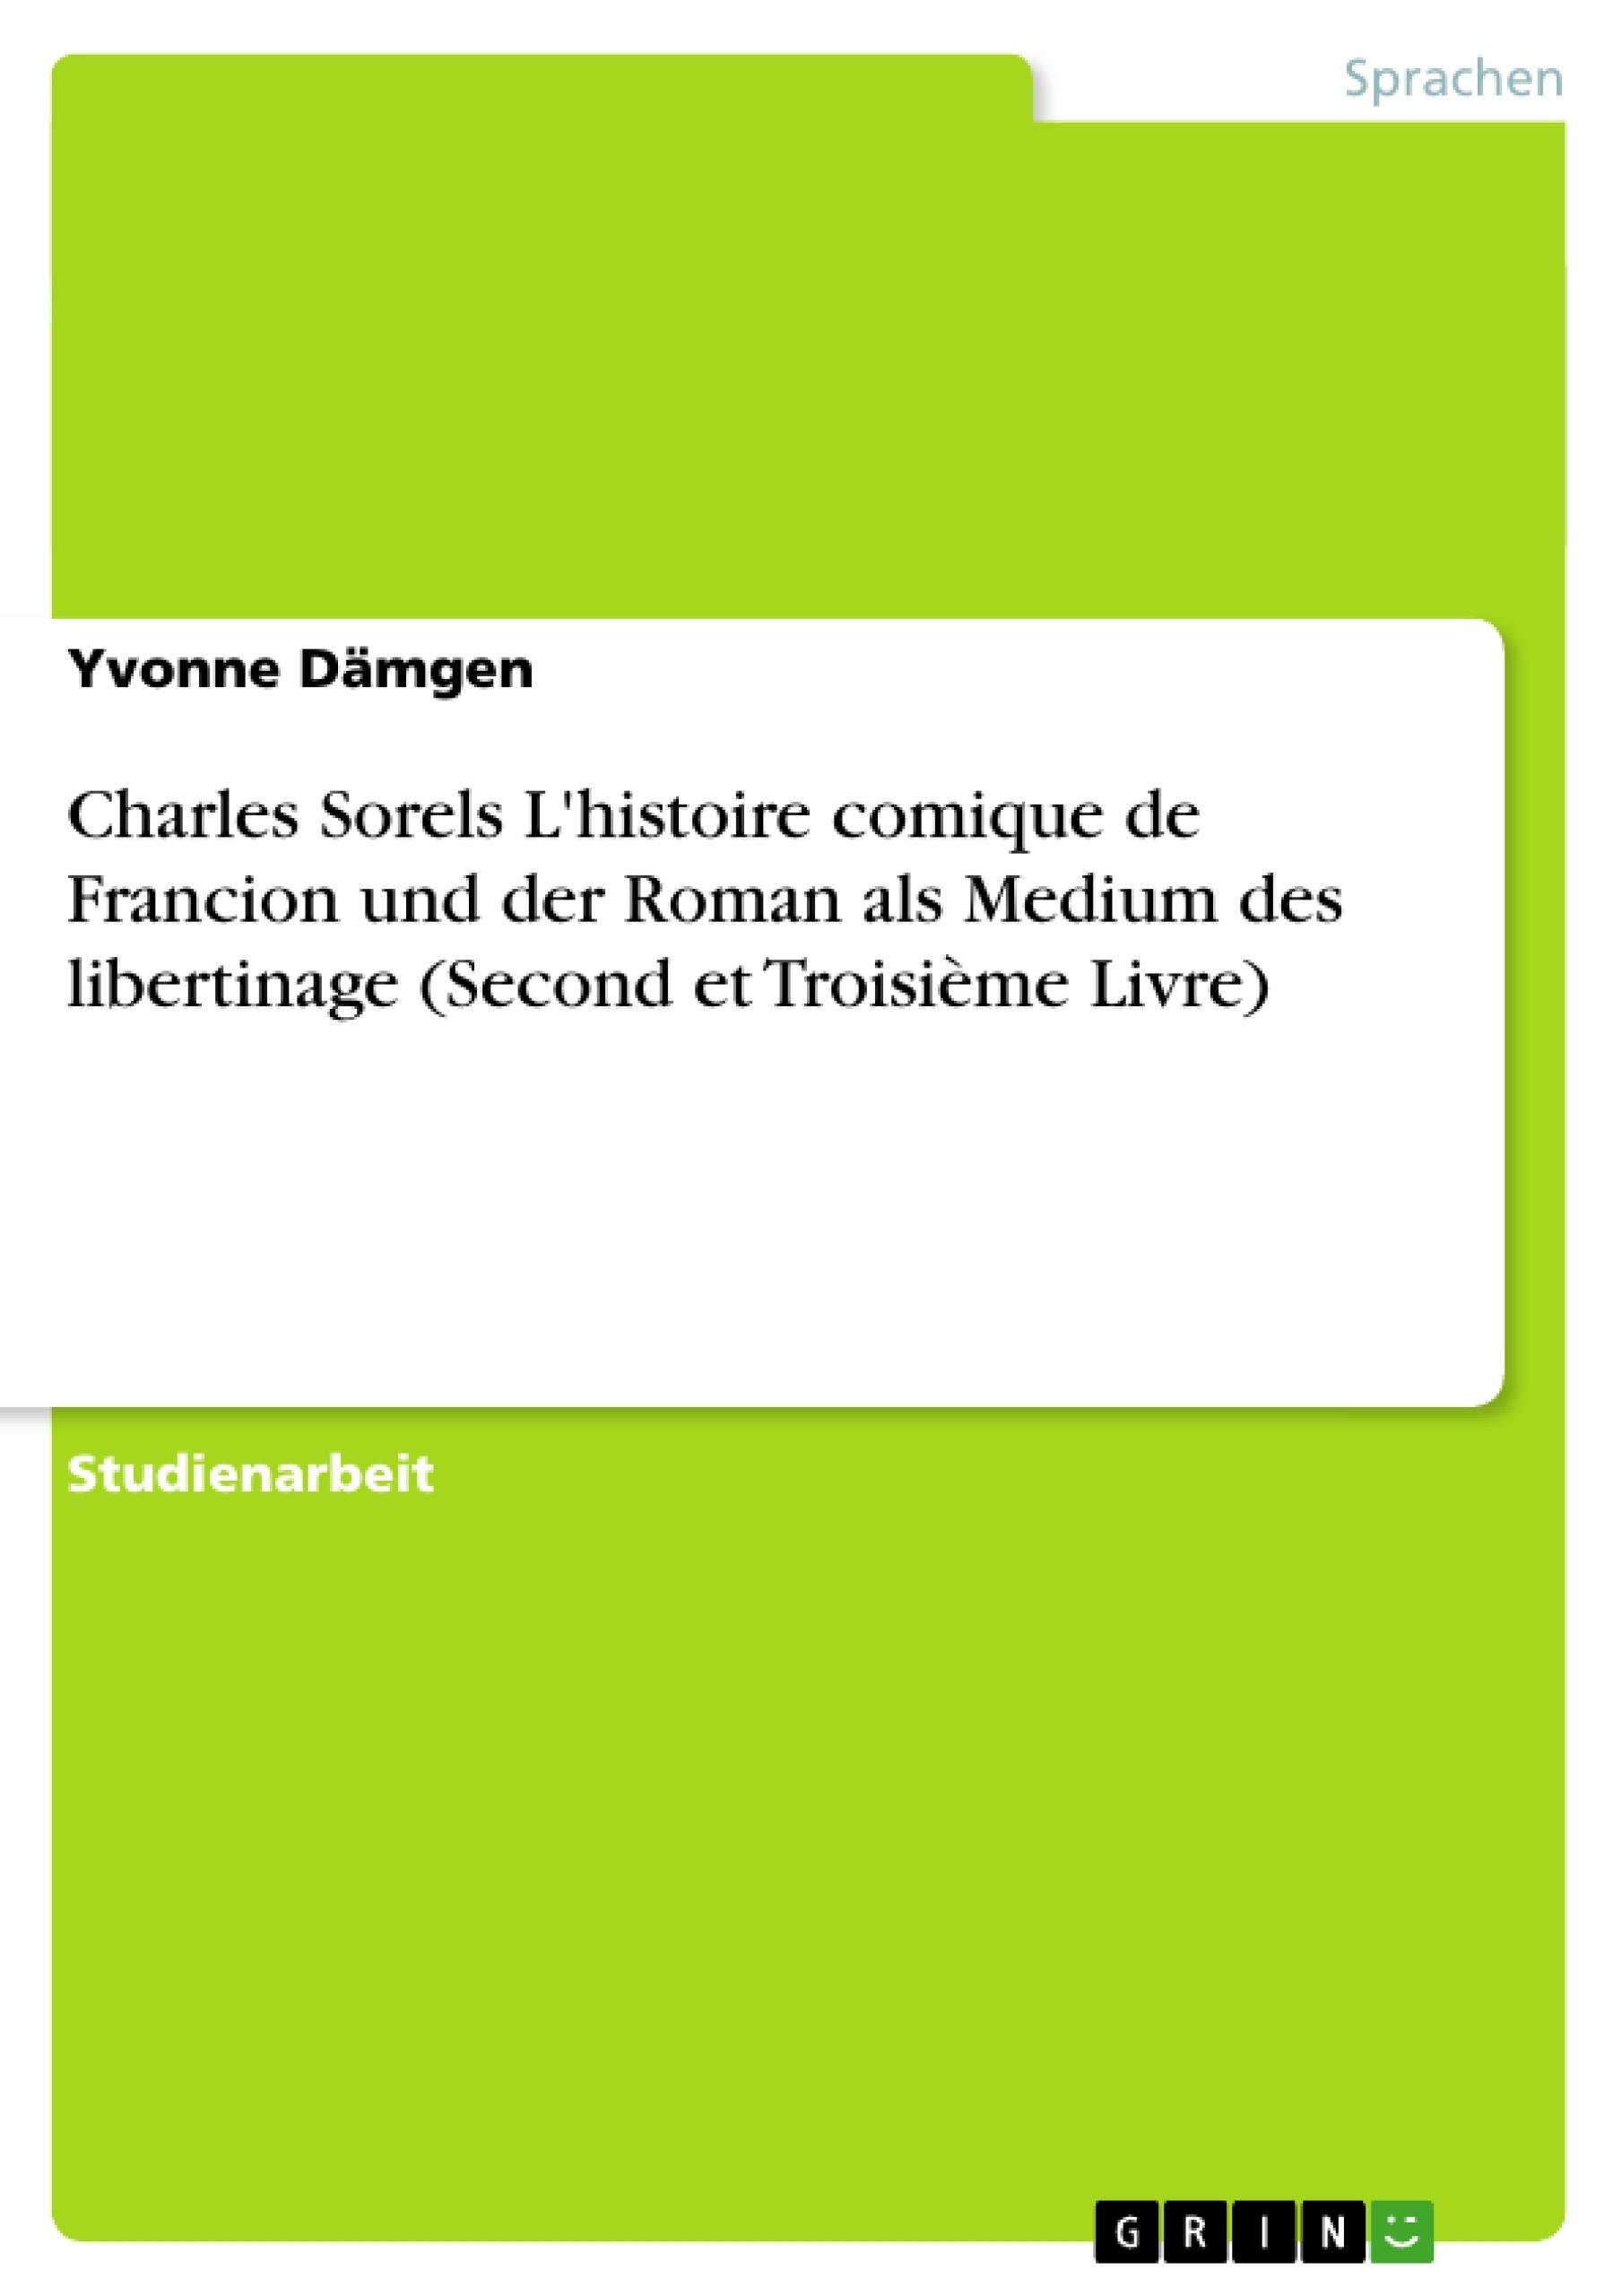 Titel: Charles Sorels L'histoire comique de Francion und der Roman als Medium des libertinage (Second et Troisième Livre)